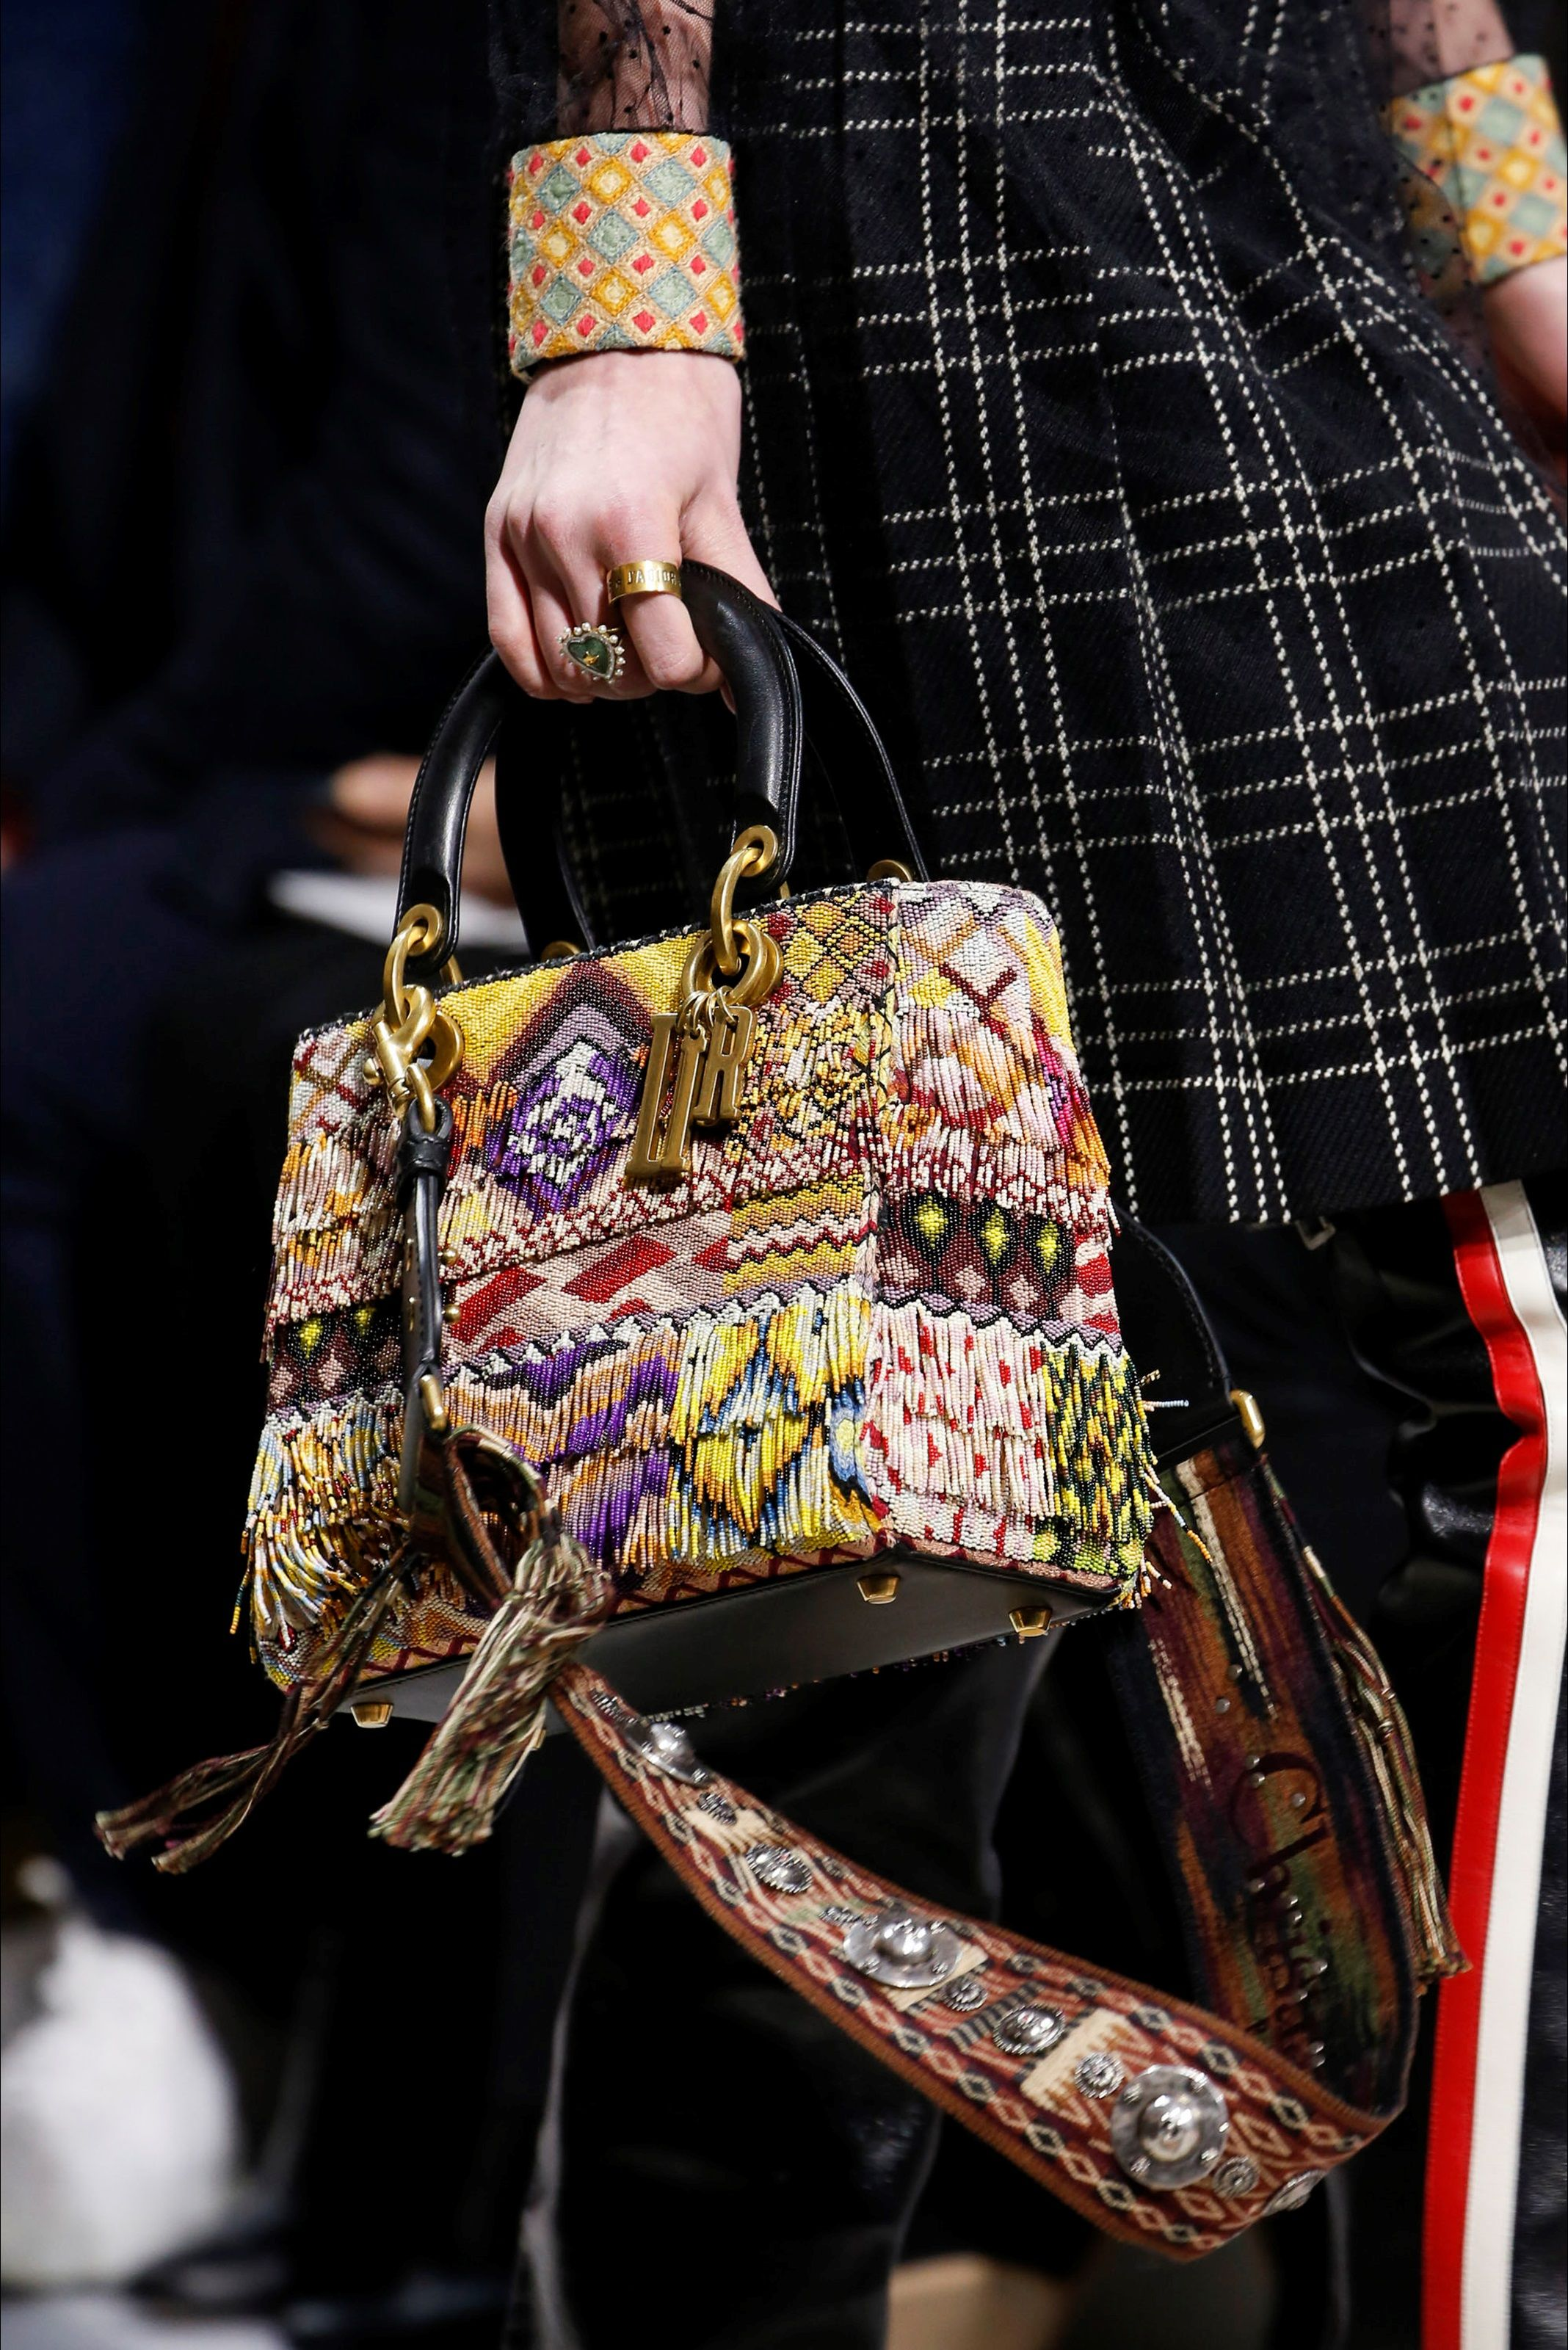 20b345e493 Christian Dior Otoño Invierno 2018/2019 - Paris #Christiandior #pfw  #fashion #readytowear